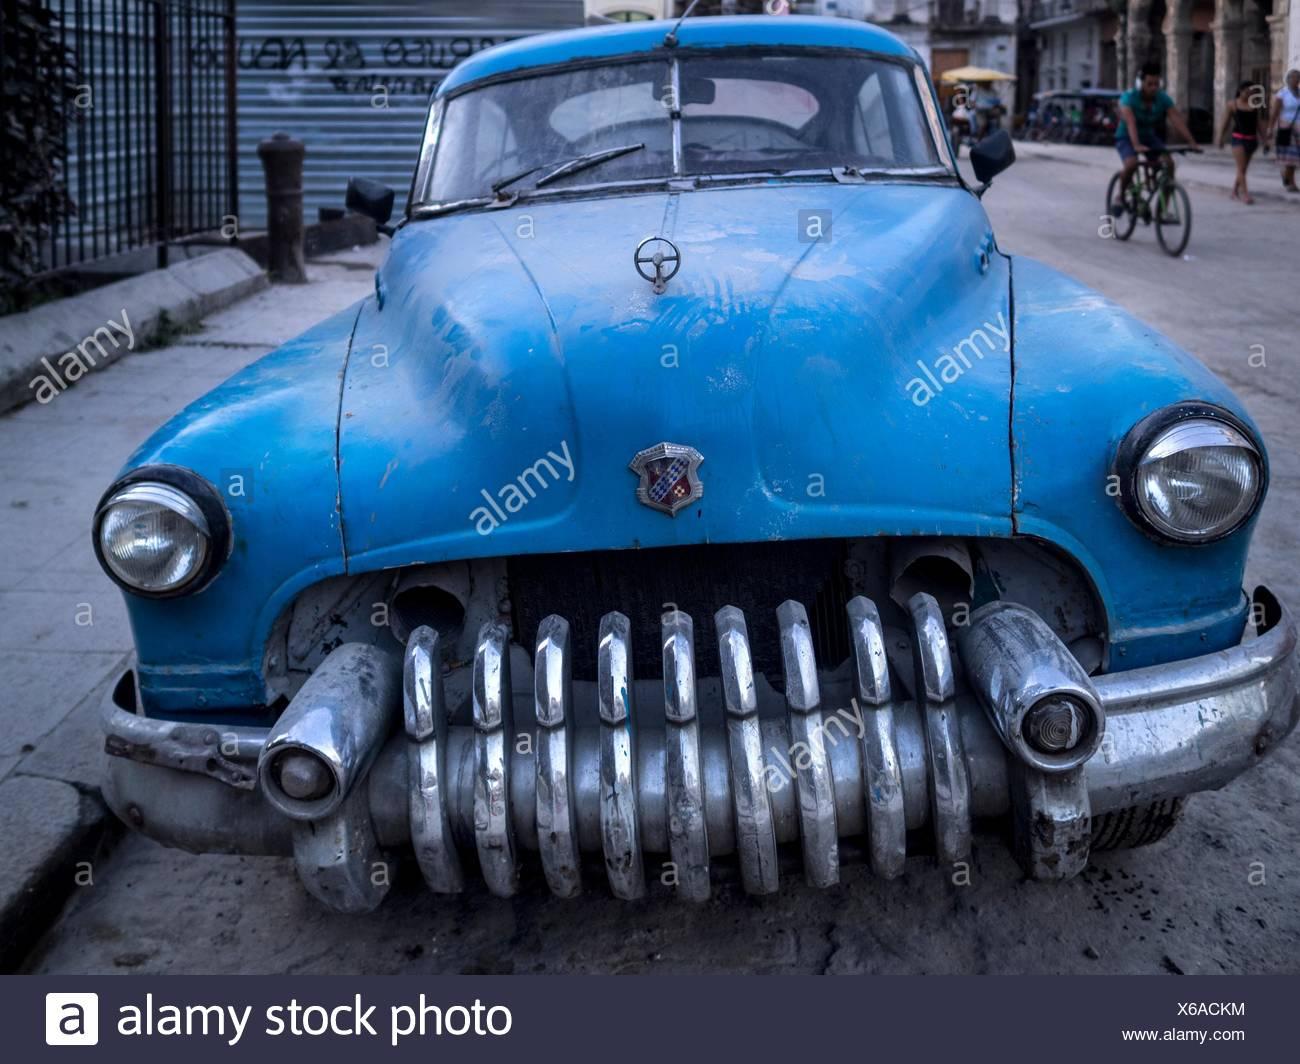 A vintage American car in La Habana Vieja district Stock Photo ...